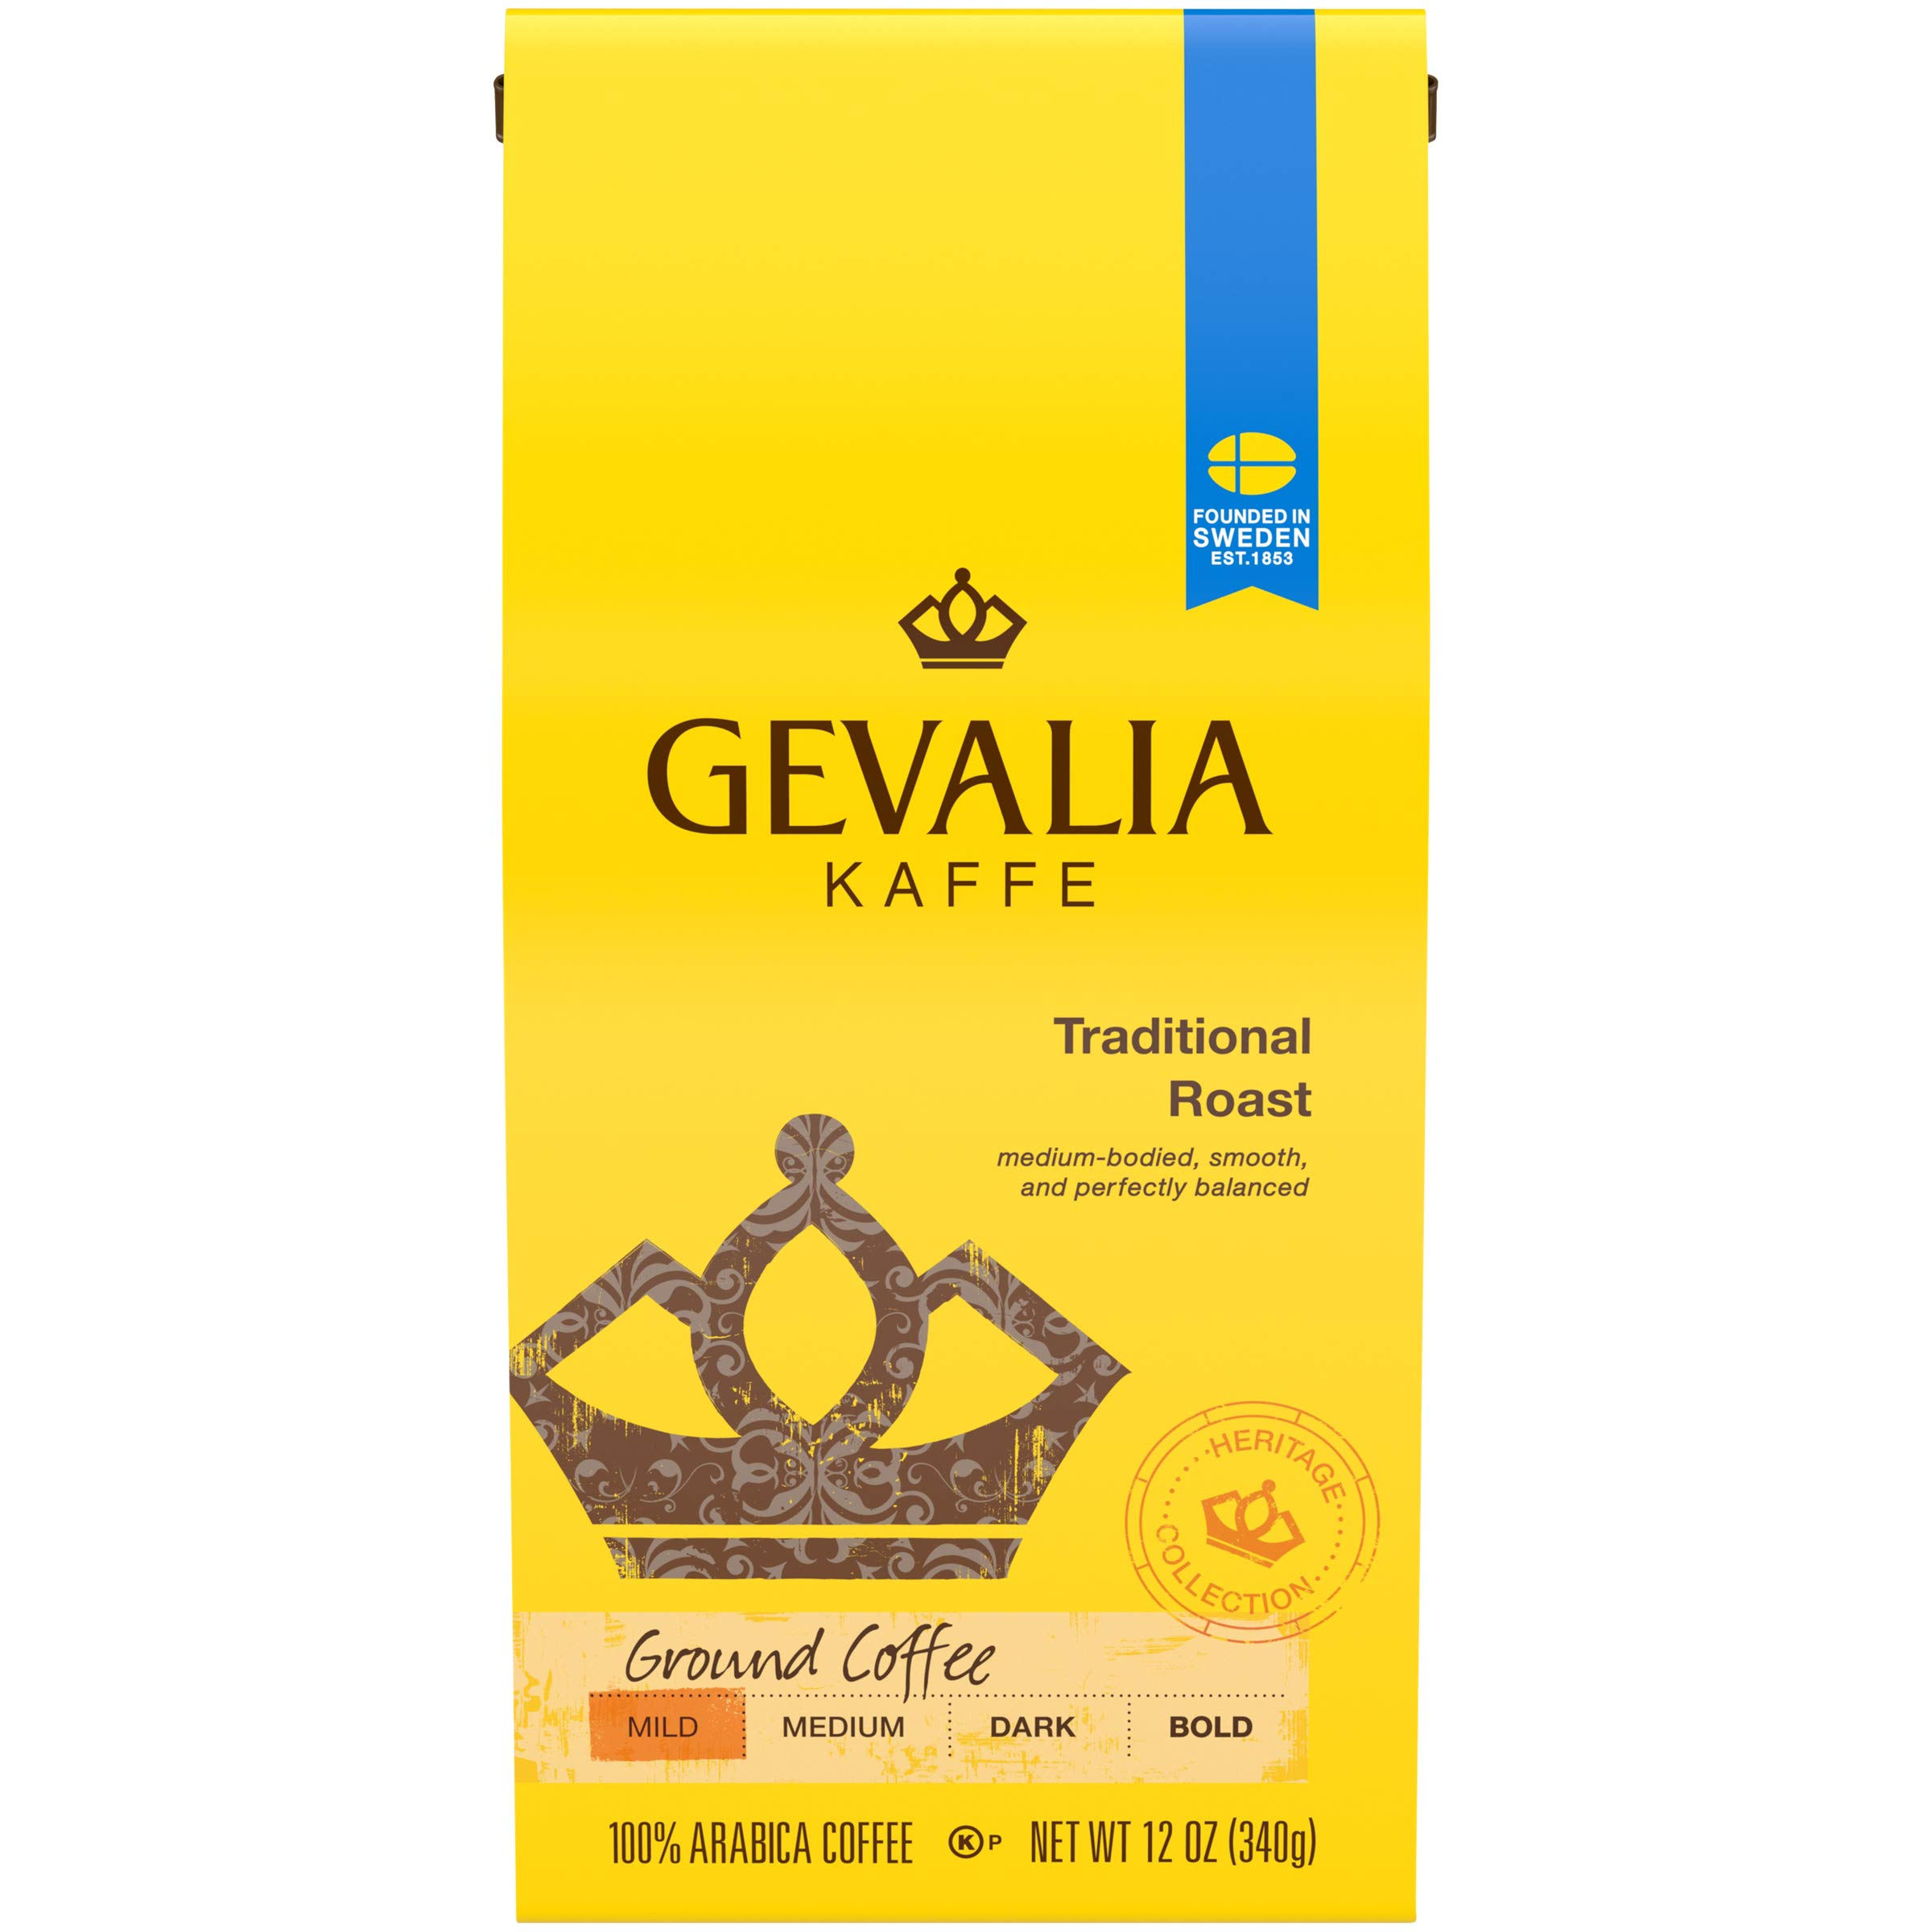 Gevalia Traditional Mild Roast Ground Coffee (12 oz Bags, Pack of 6) by Gevalia